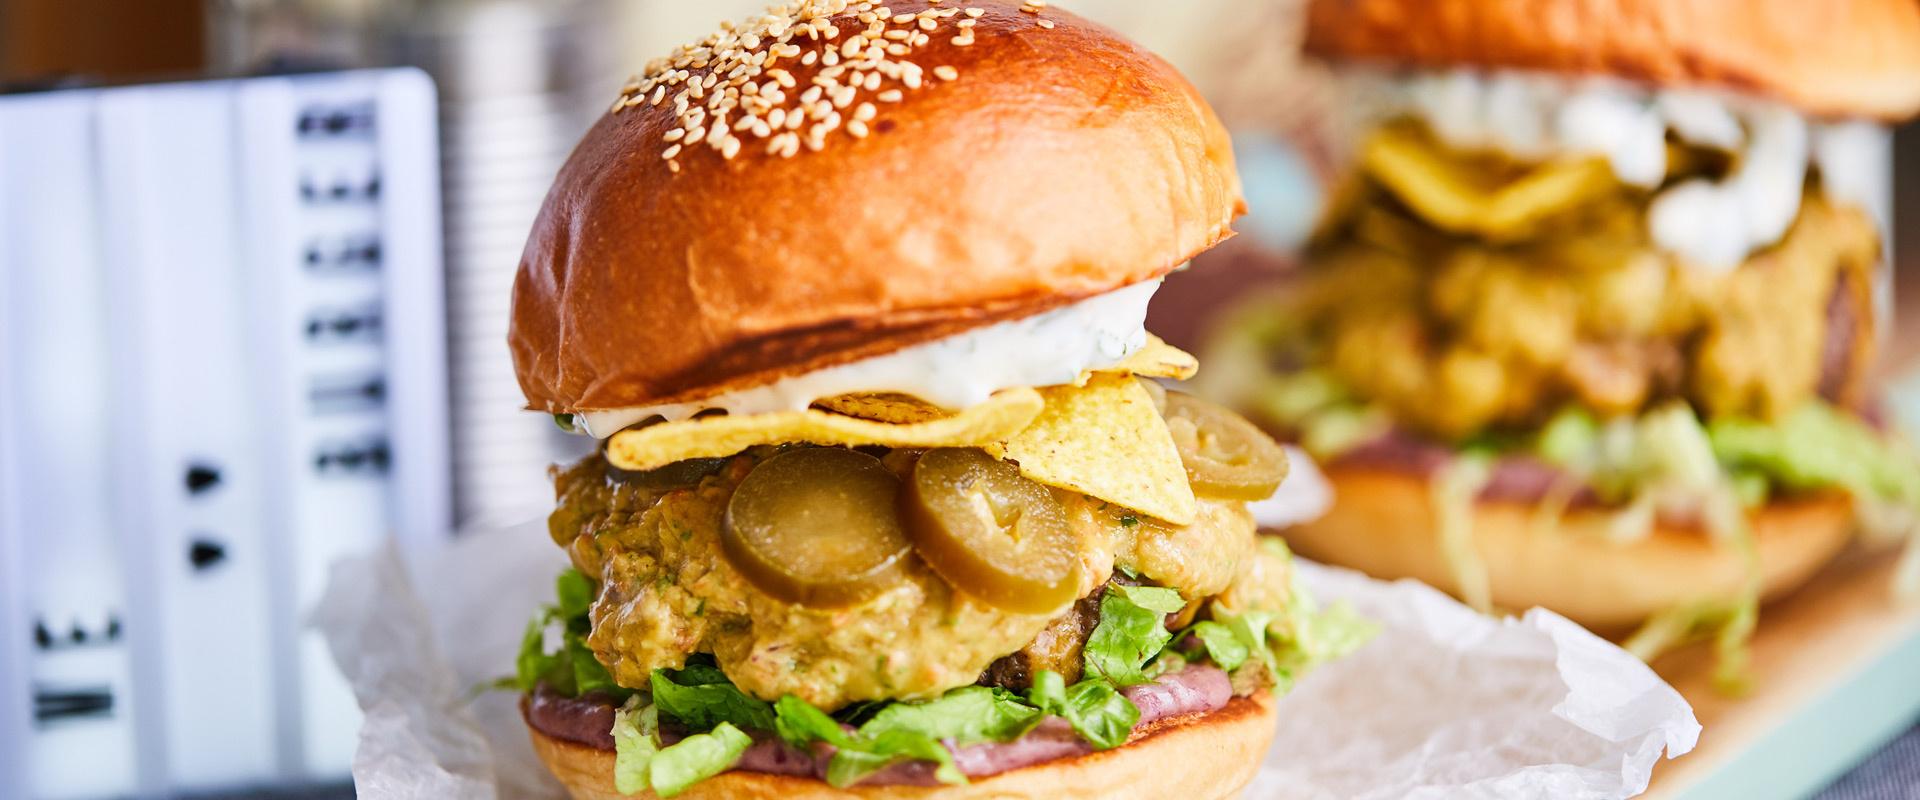 mexikói-burger